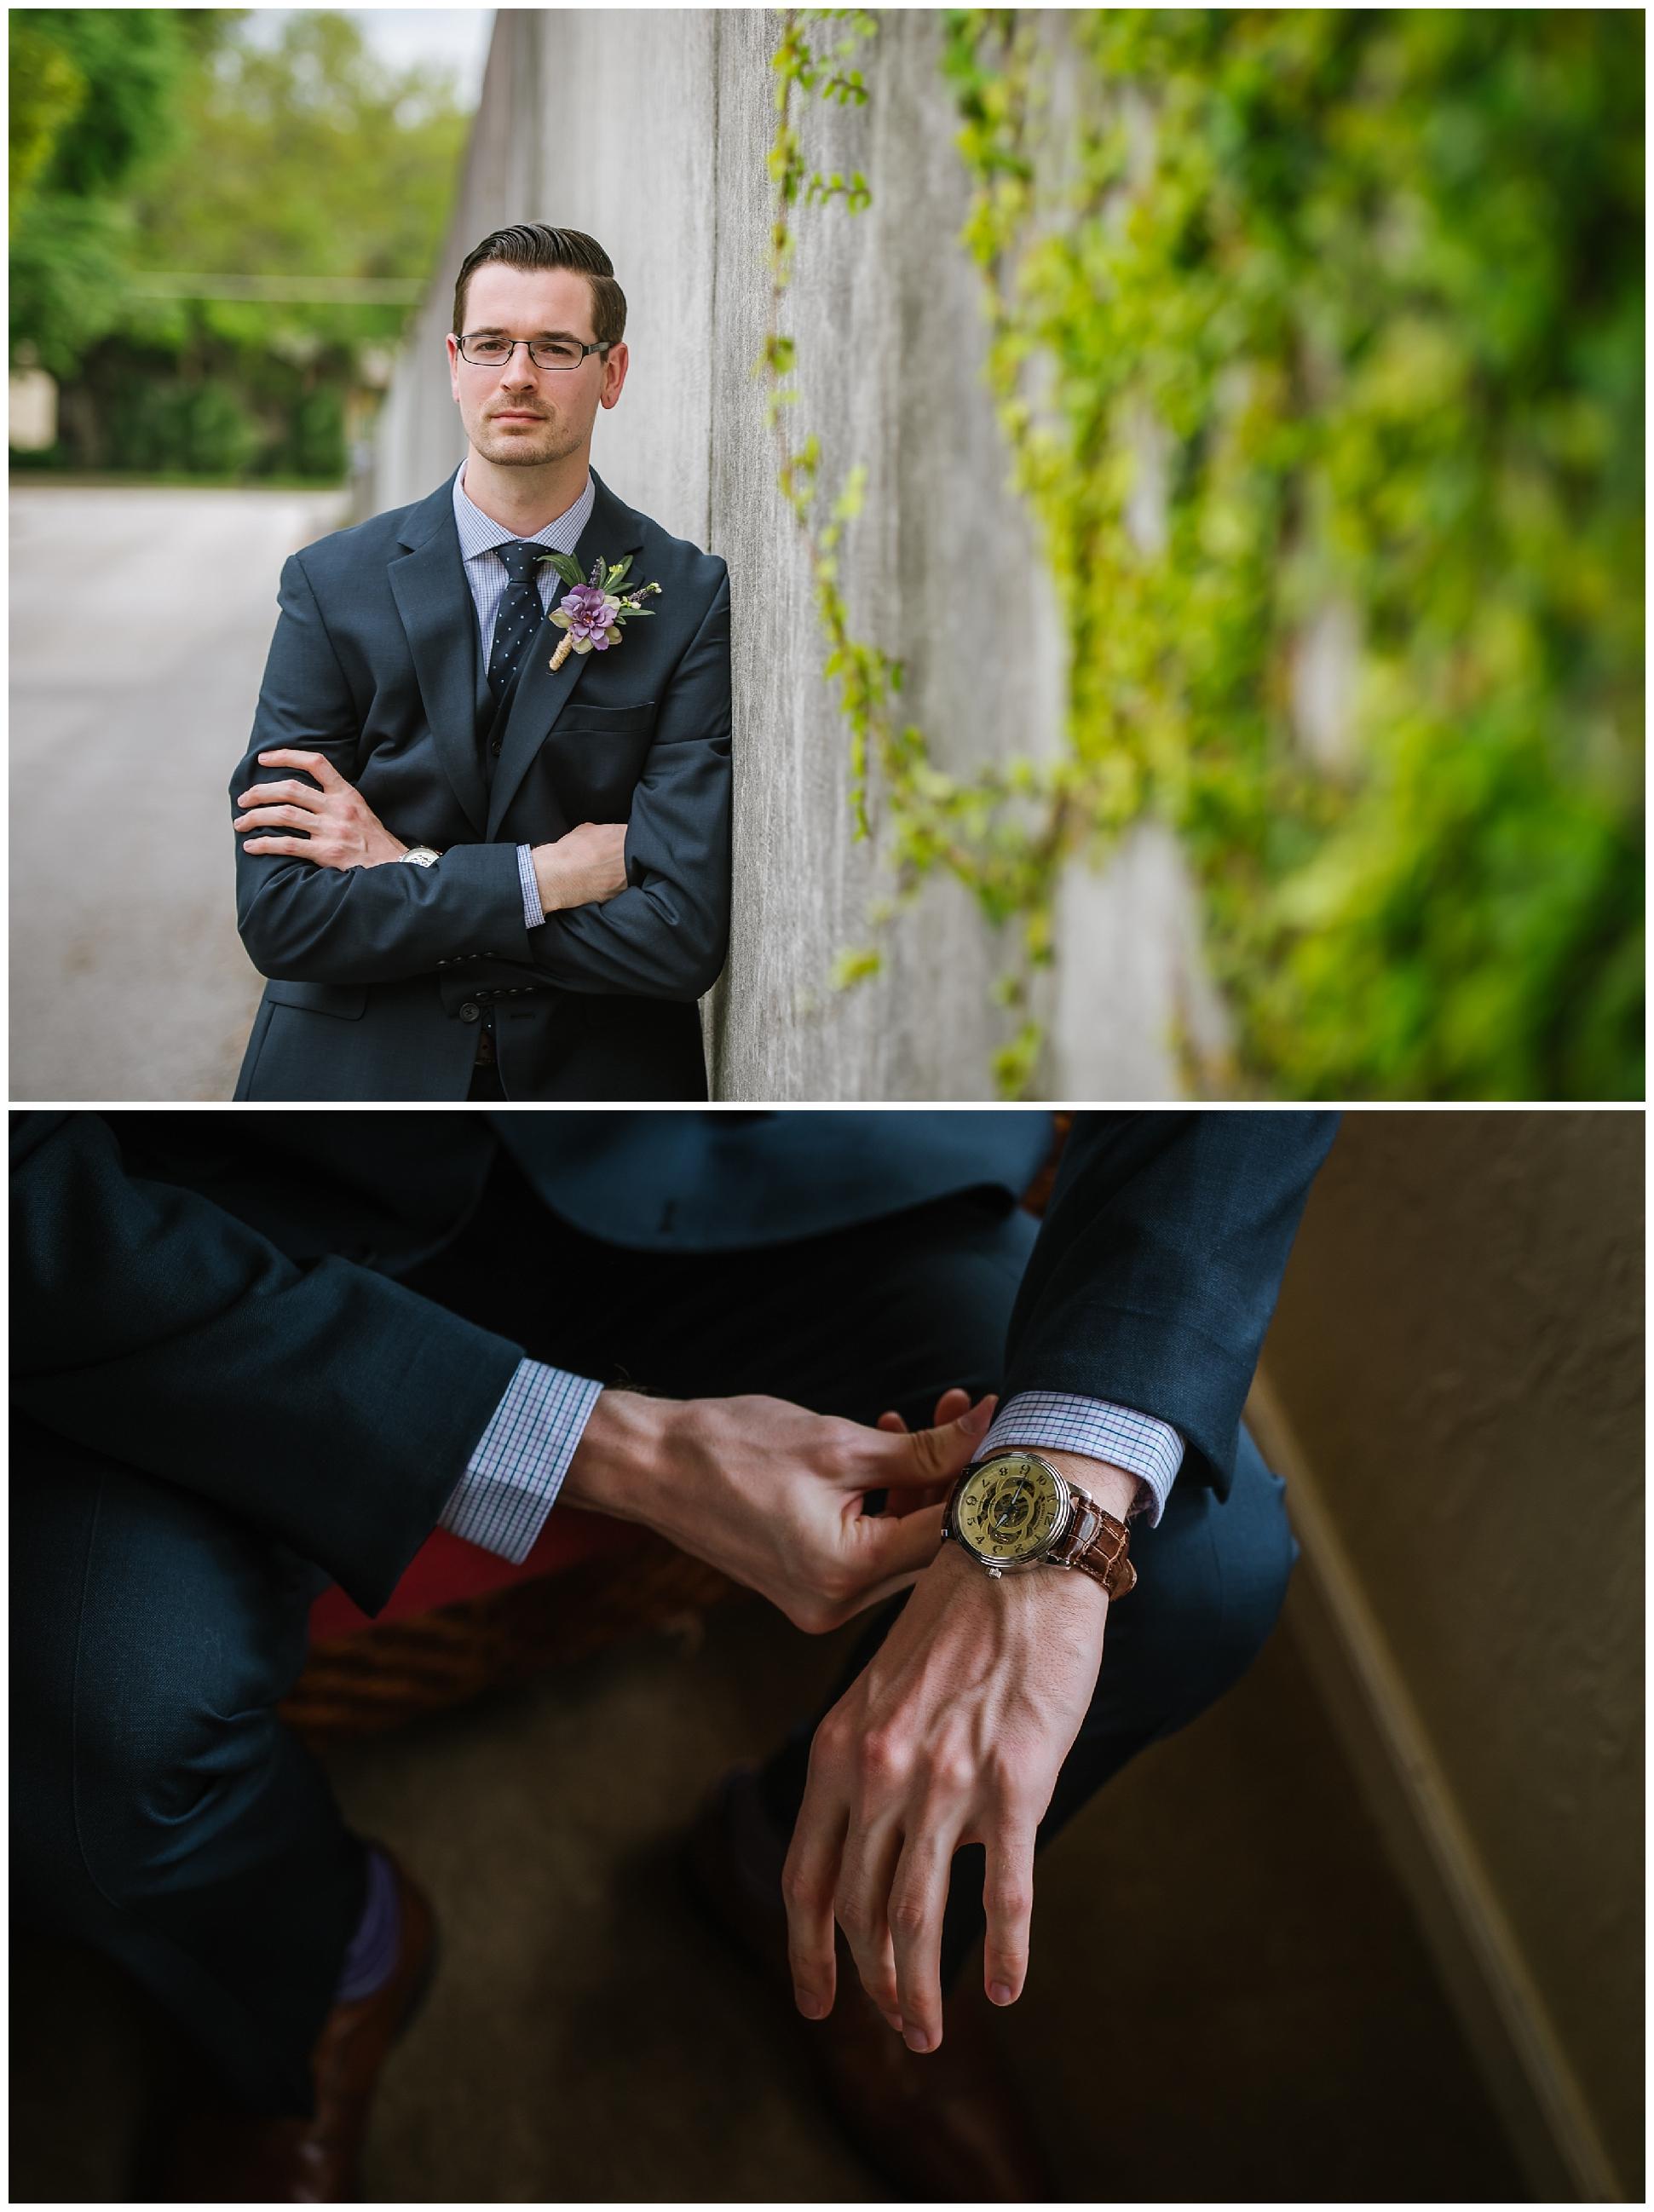 Ashlee-hamon-photography-year-in-review-2016-travel-wanderlust-vsco-adventure-wedding_0033.jpg